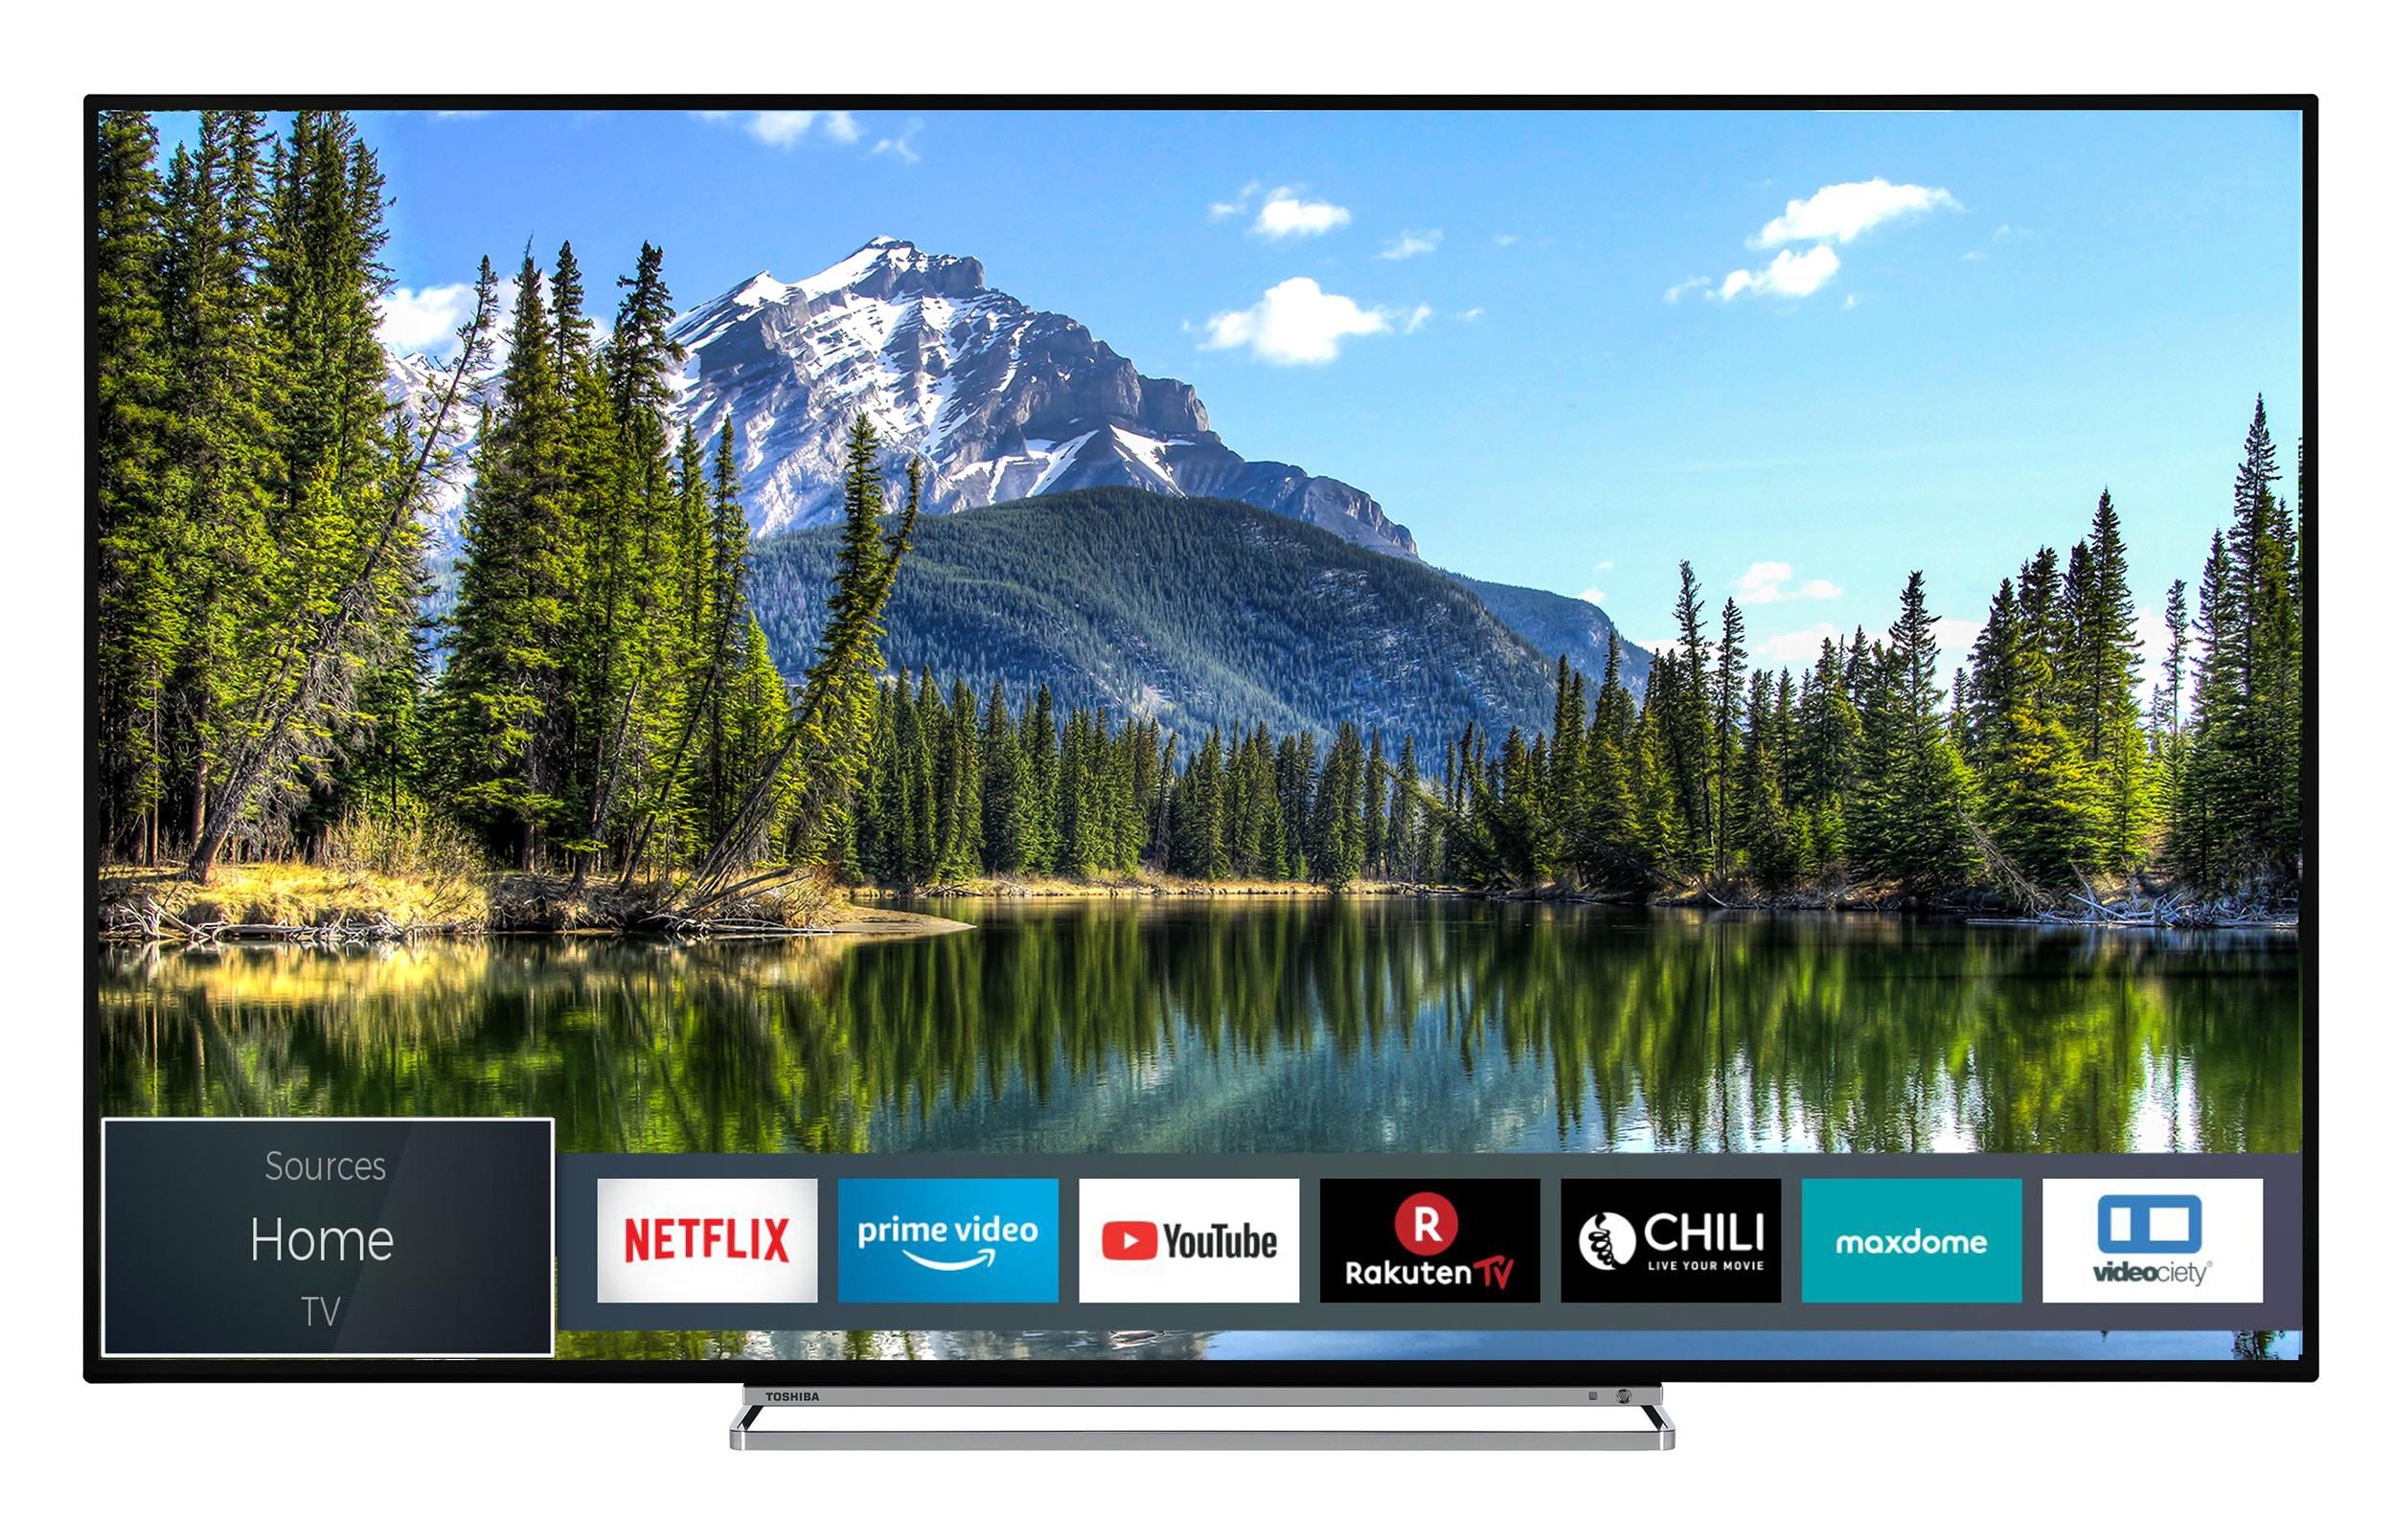 toshiba led fernseher 55 zoll 4k uhd smart tv triple tuner 55vl5a63dg auf raten bestellen. Black Bedroom Furniture Sets. Home Design Ideas